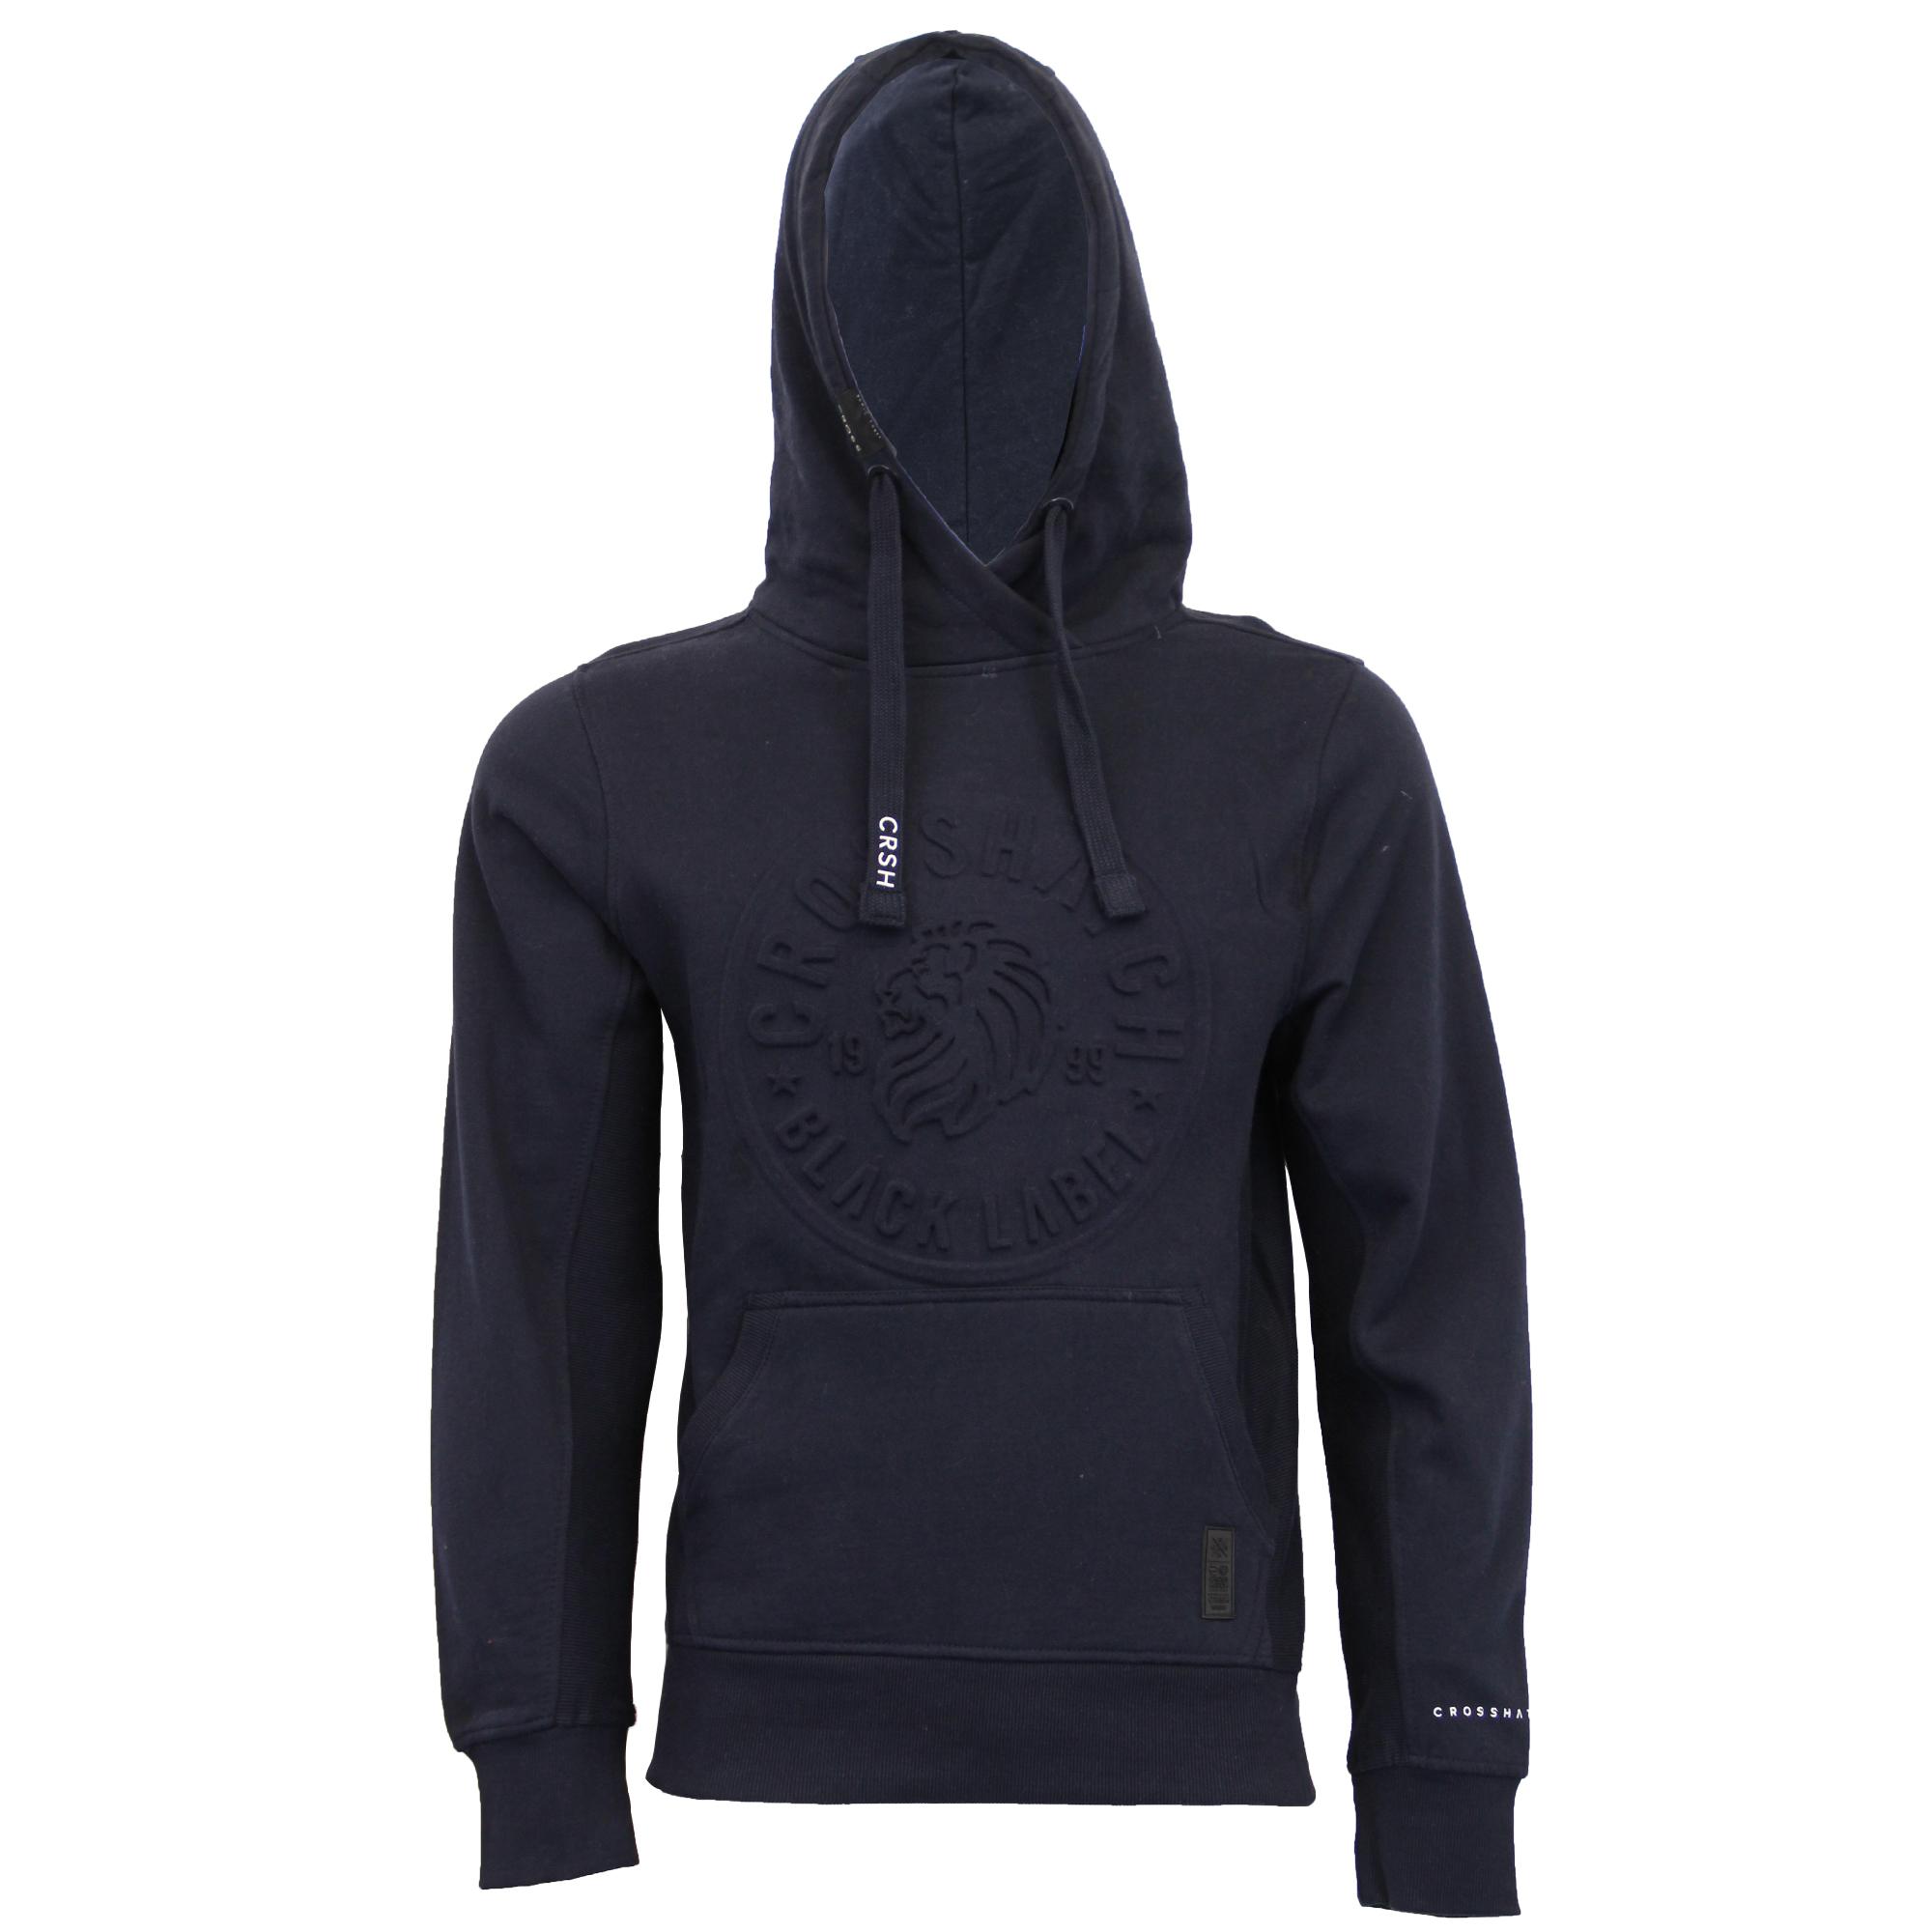 Mens-Sweatshirt-Crosshatch-Hoodie-Top-Embossed-Logo-Print-Sweat-Fleece-Lined-New thumbnail 16